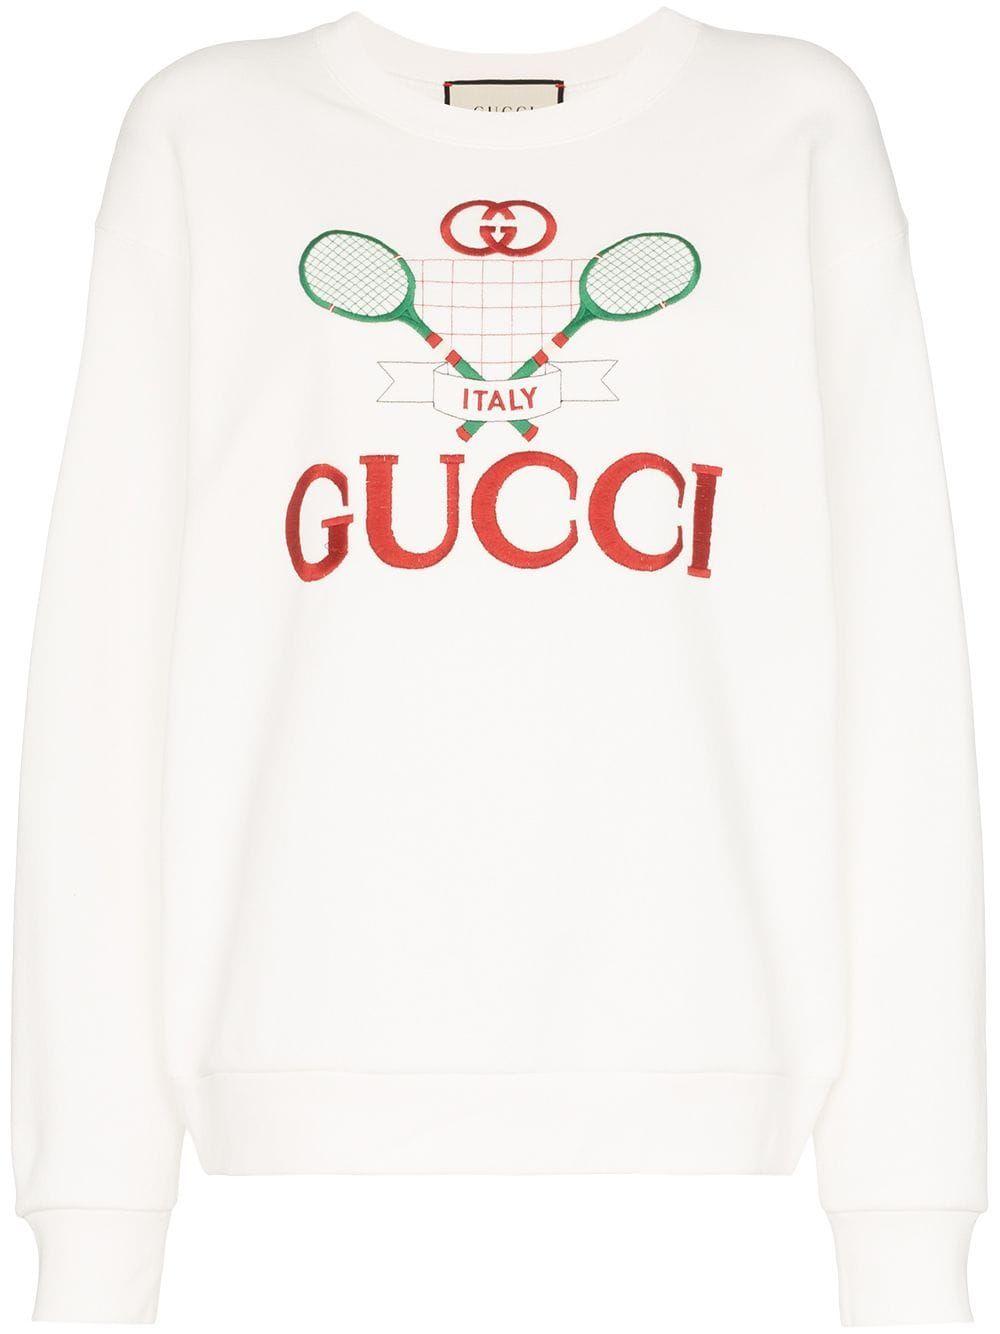 Gucci Gucci Embroidered Sweatshirt Farfetch Sweatshirts Oversized Sweatshirt Embroidered Sweatshirts [ 1334 x 1000 Pixel ]